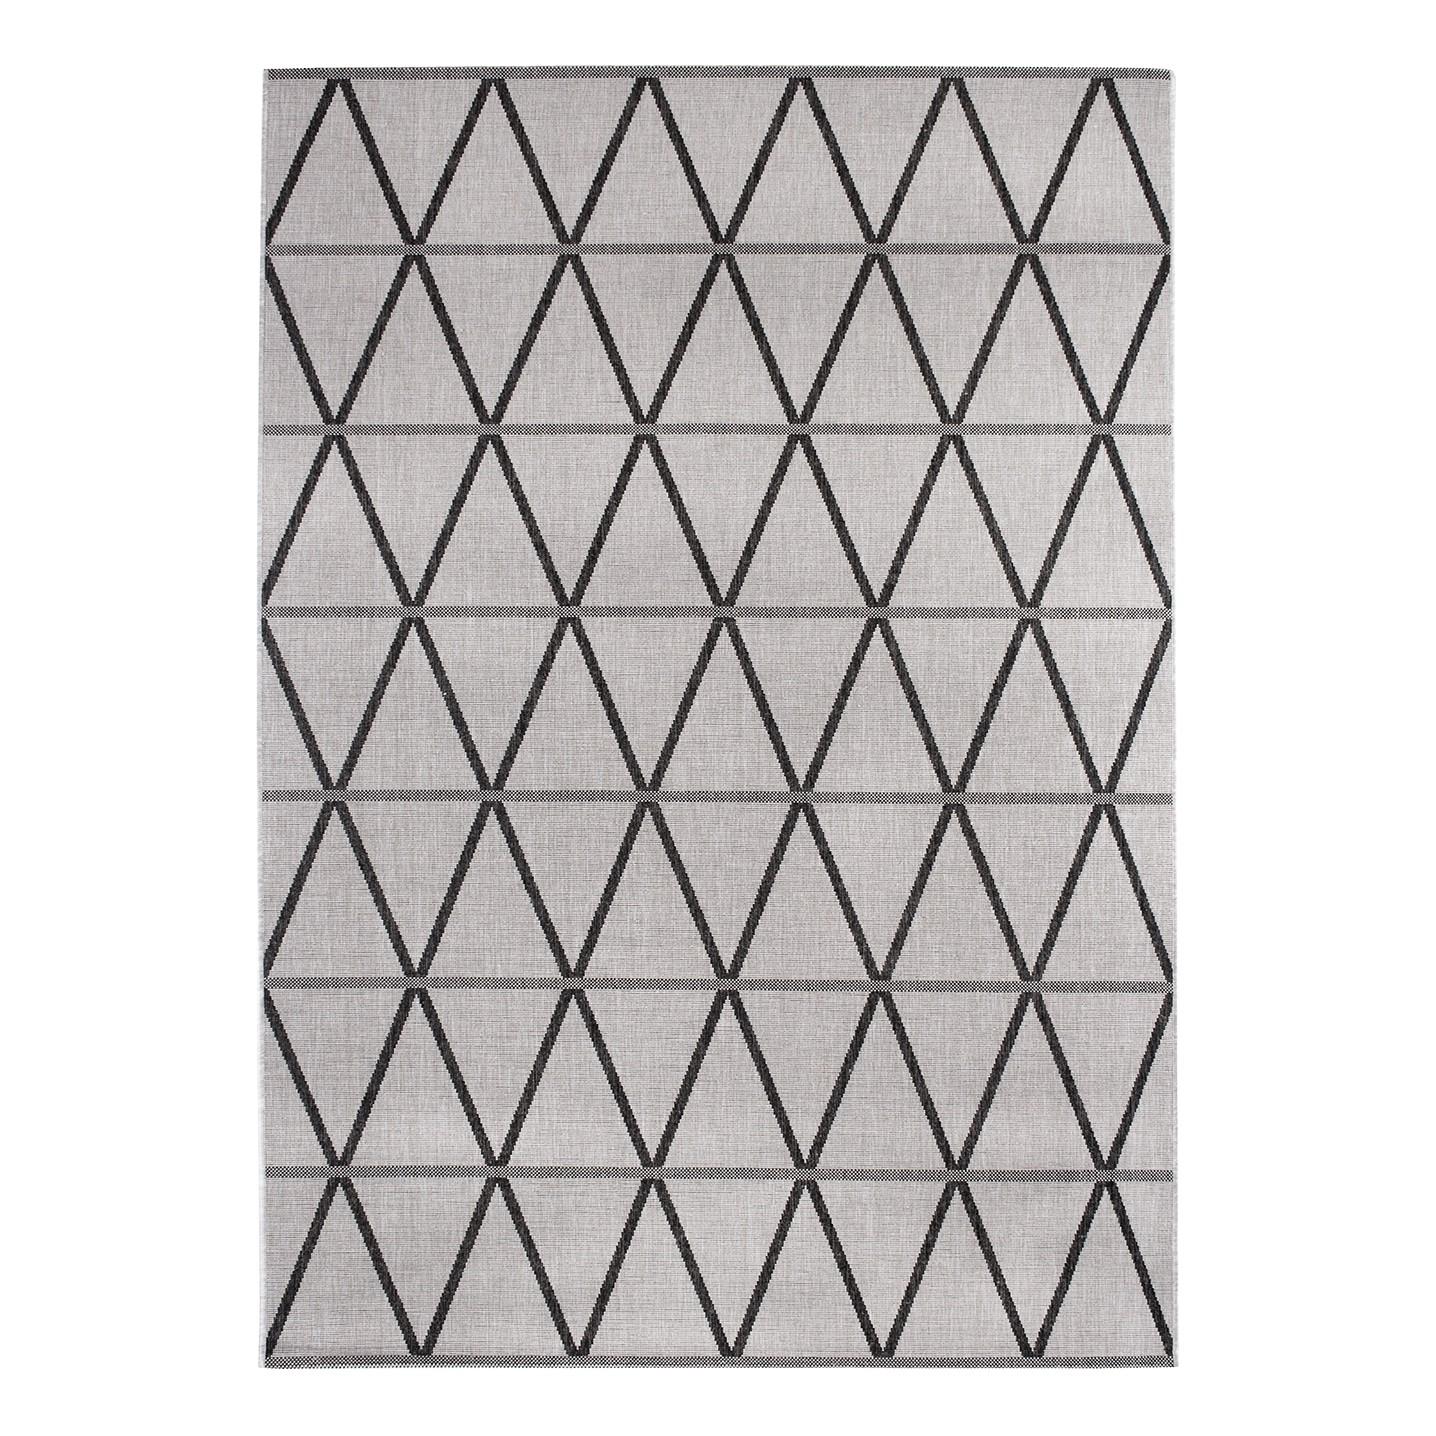 Teppich Kandava - Kunstfaser - Grau / Schwarz - 67 x 140 cm, Morteens